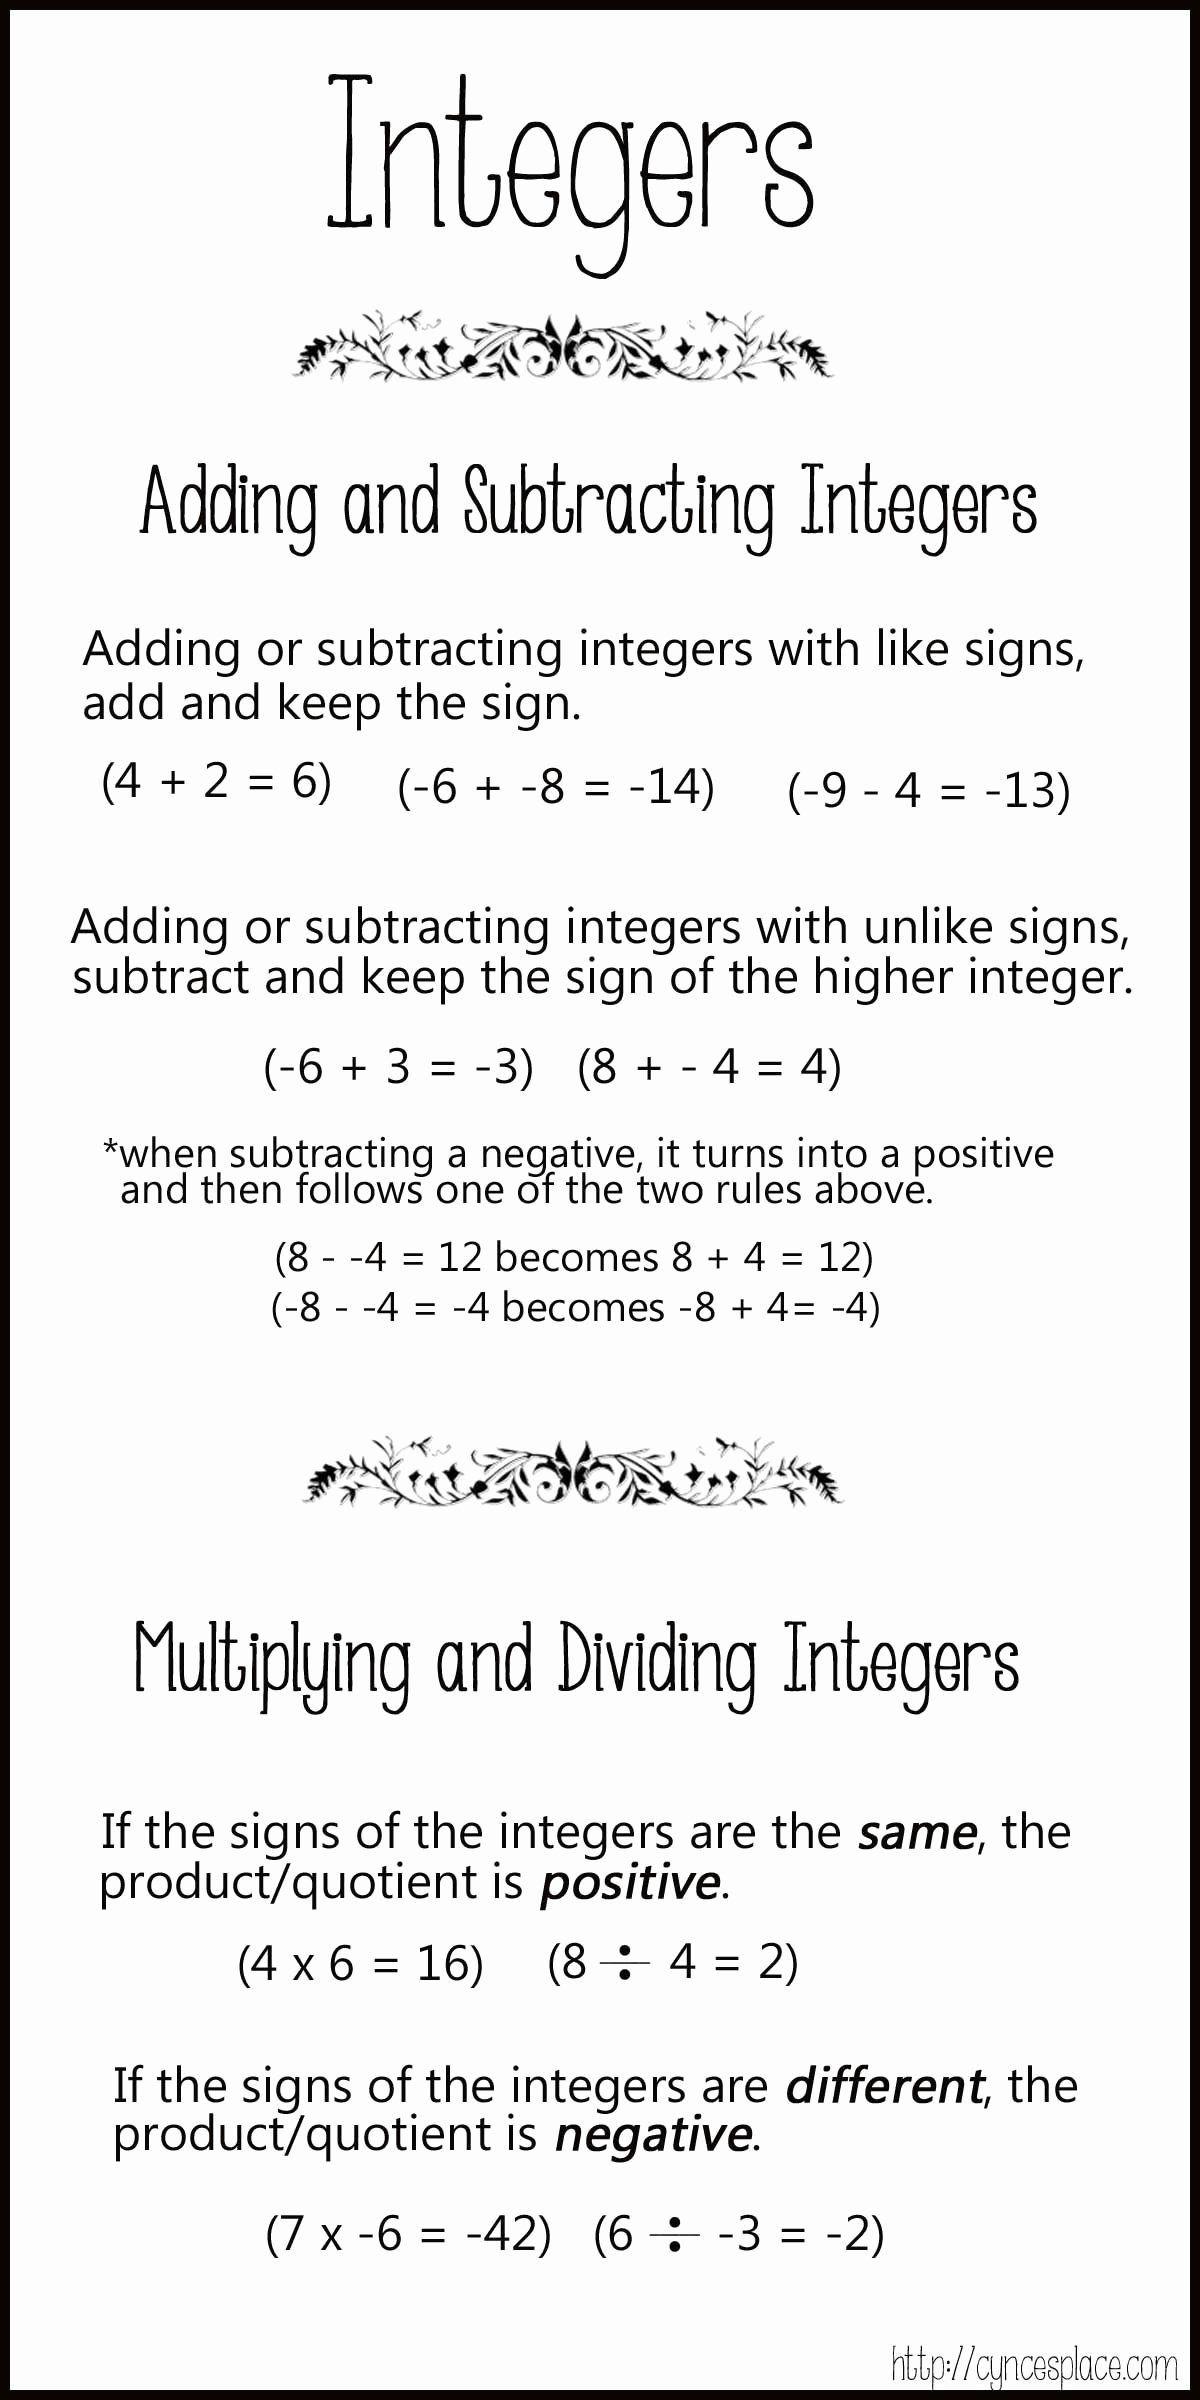 Multiplying and Dividing Integers Worksheet Multiplying and Dividing Integers Worksheet Elegant Adding